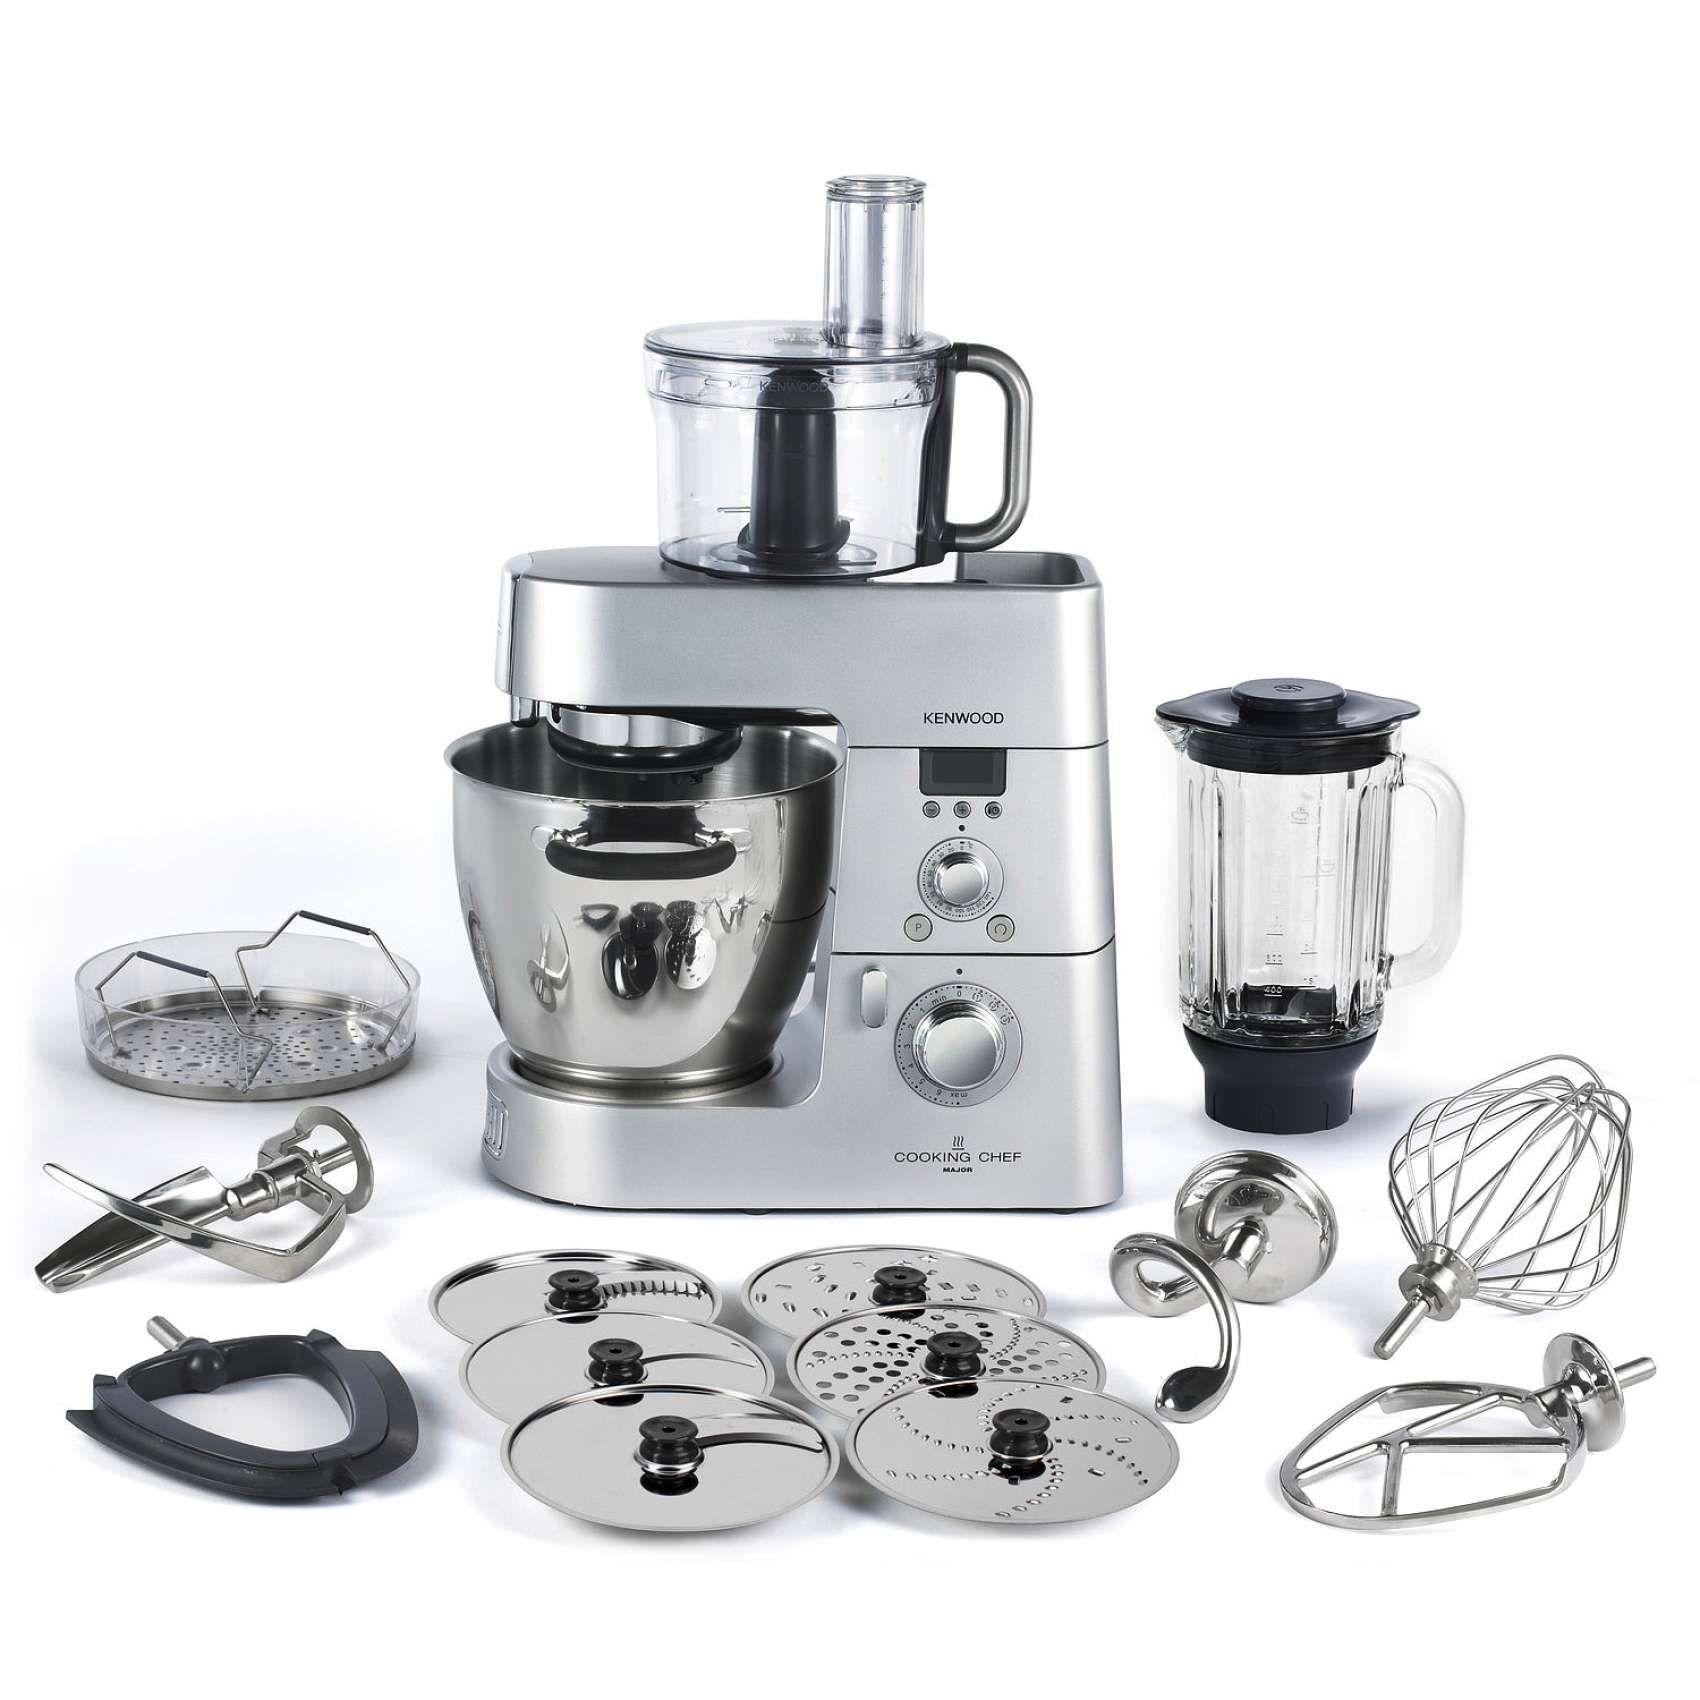 Kenwood Cooking Chef Induction Kitchen Machine Sur La Table